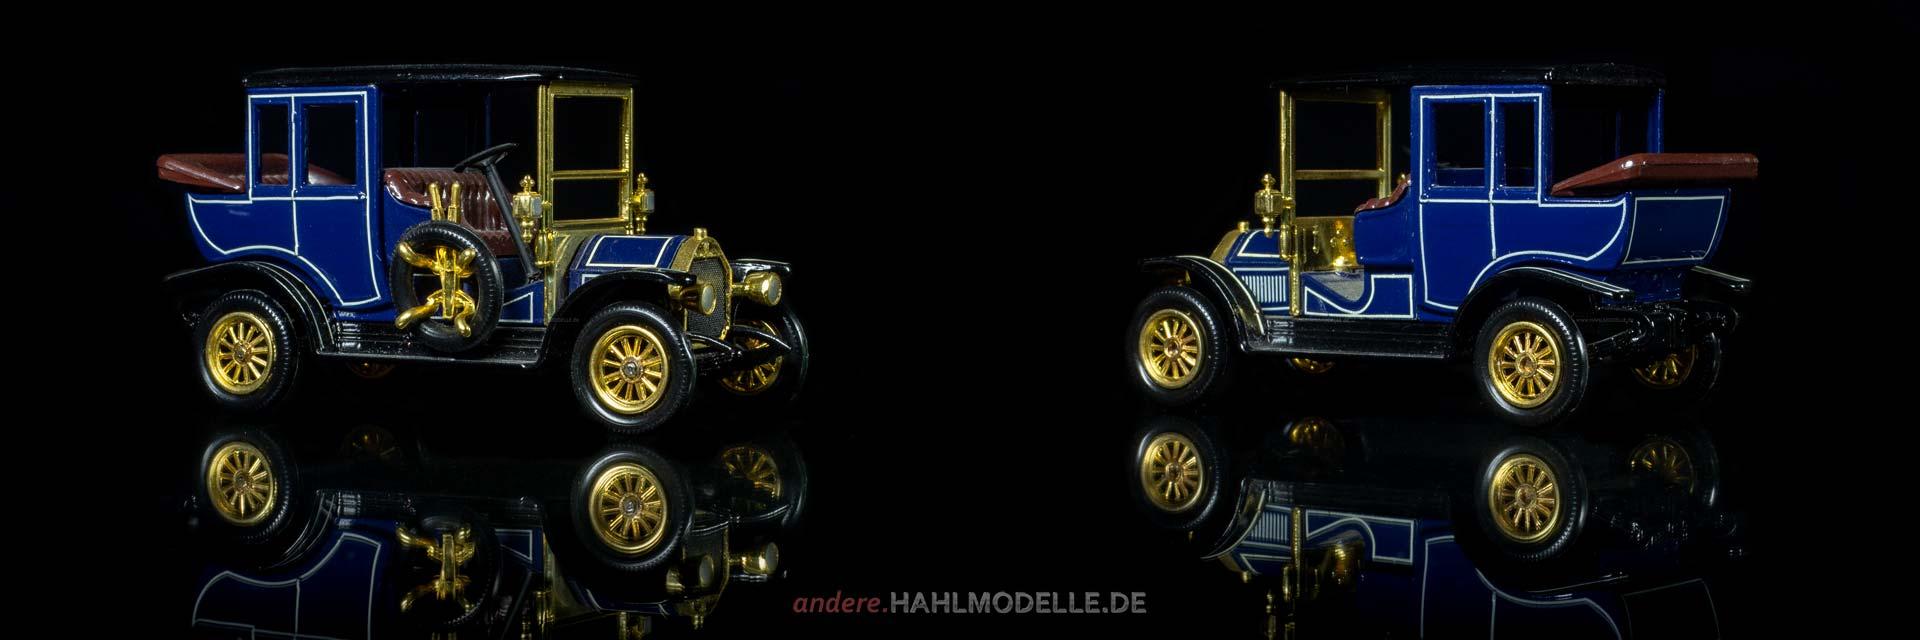 Benz 24/40 PS | Landaulet | Matchbox | 1:43 | www.andere.hahlmodelle.de